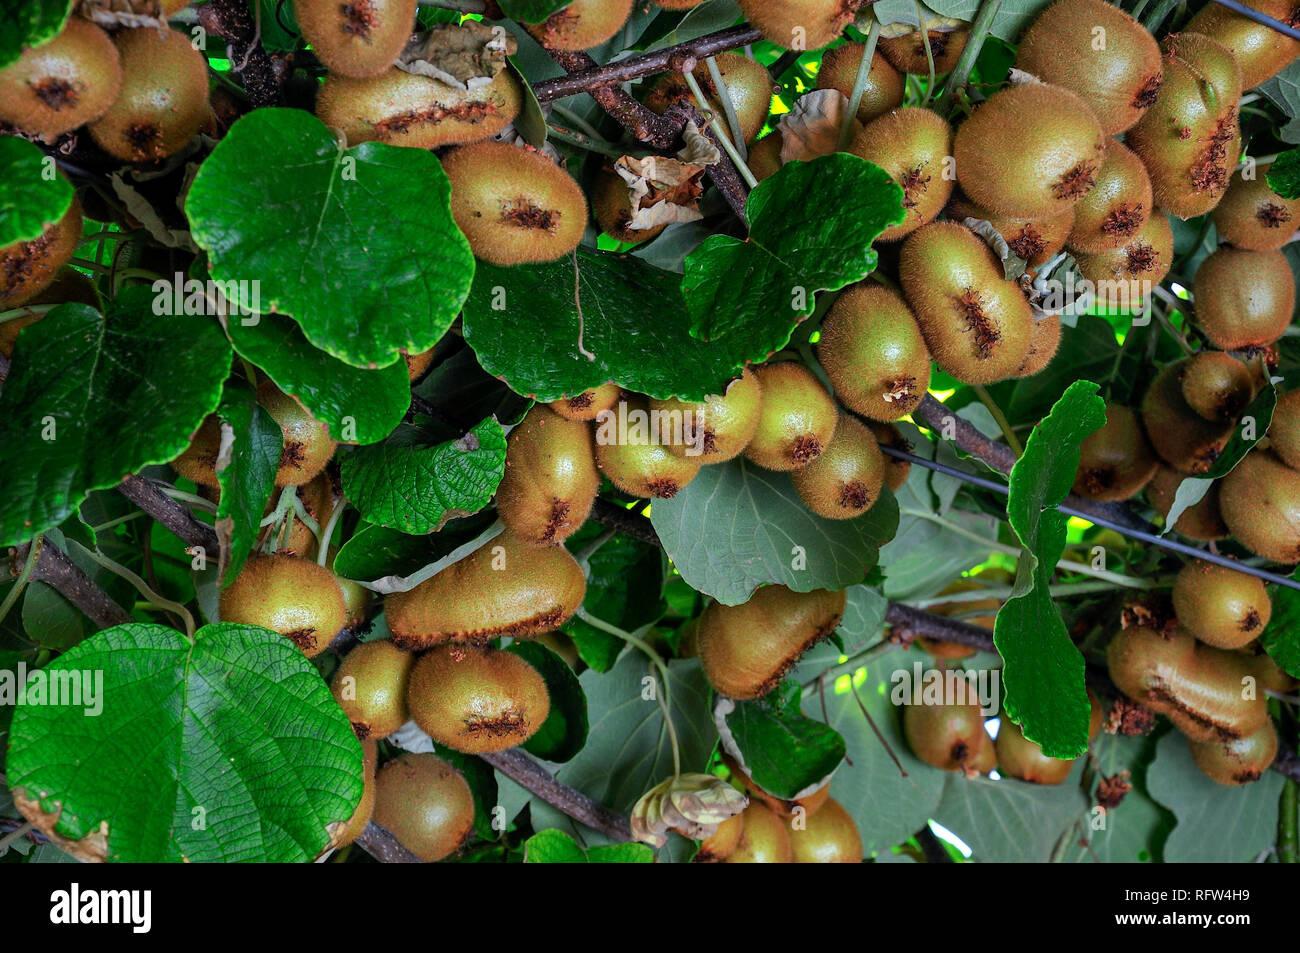 Kiwi fruit on a tree branch. Ripe fruits of kiwi plant organic cultivation. - Stock Image